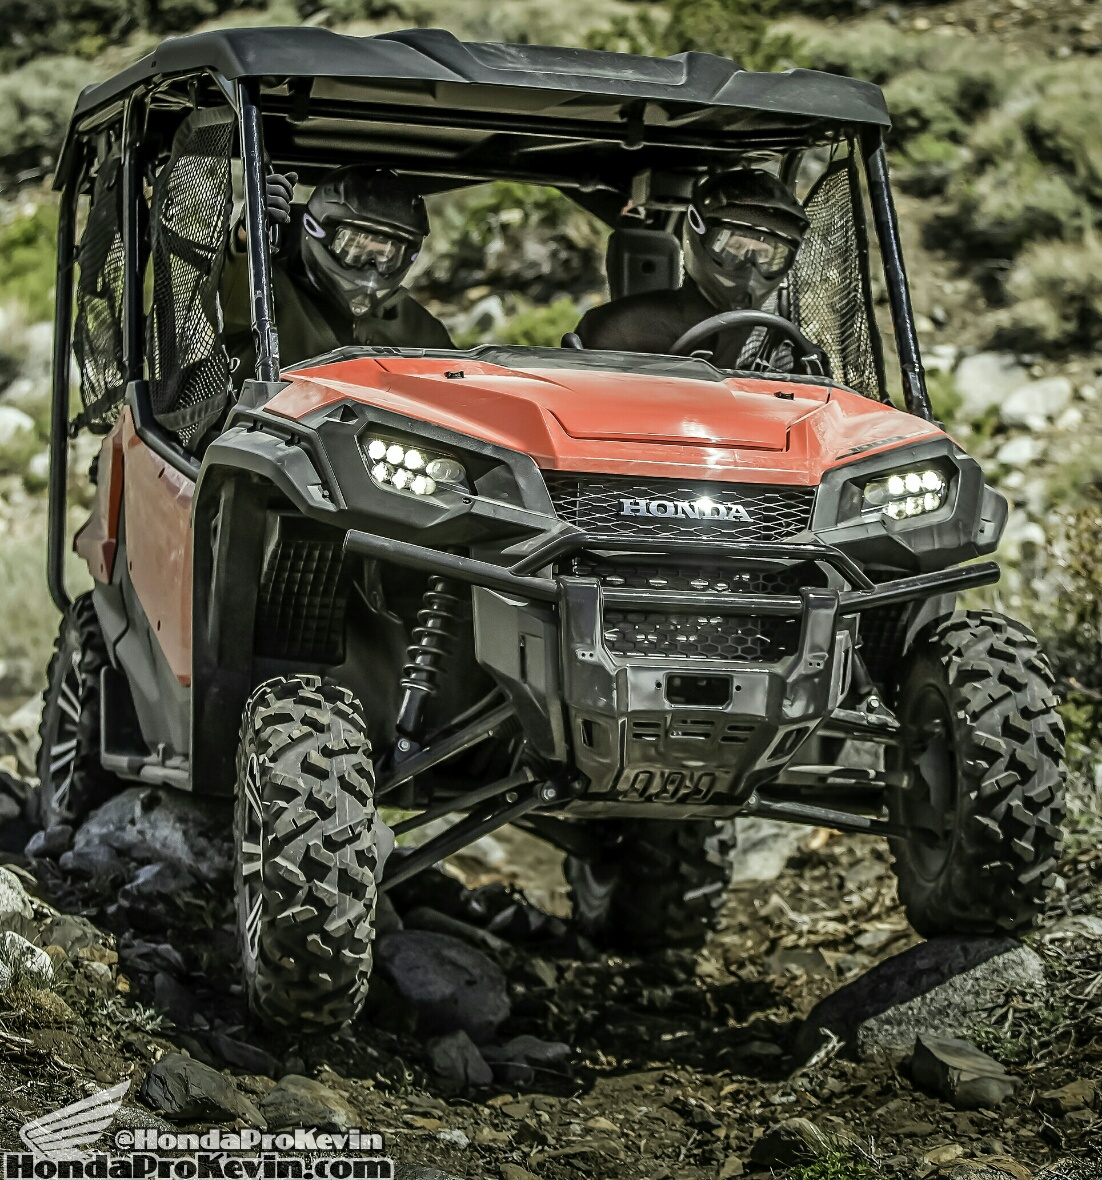 2018 Honda Pioneer 1000-5 Review / Specs - HP Performance / Price / Side by Side ATV / UTV / SxS / 4x4 Utility Vehicle